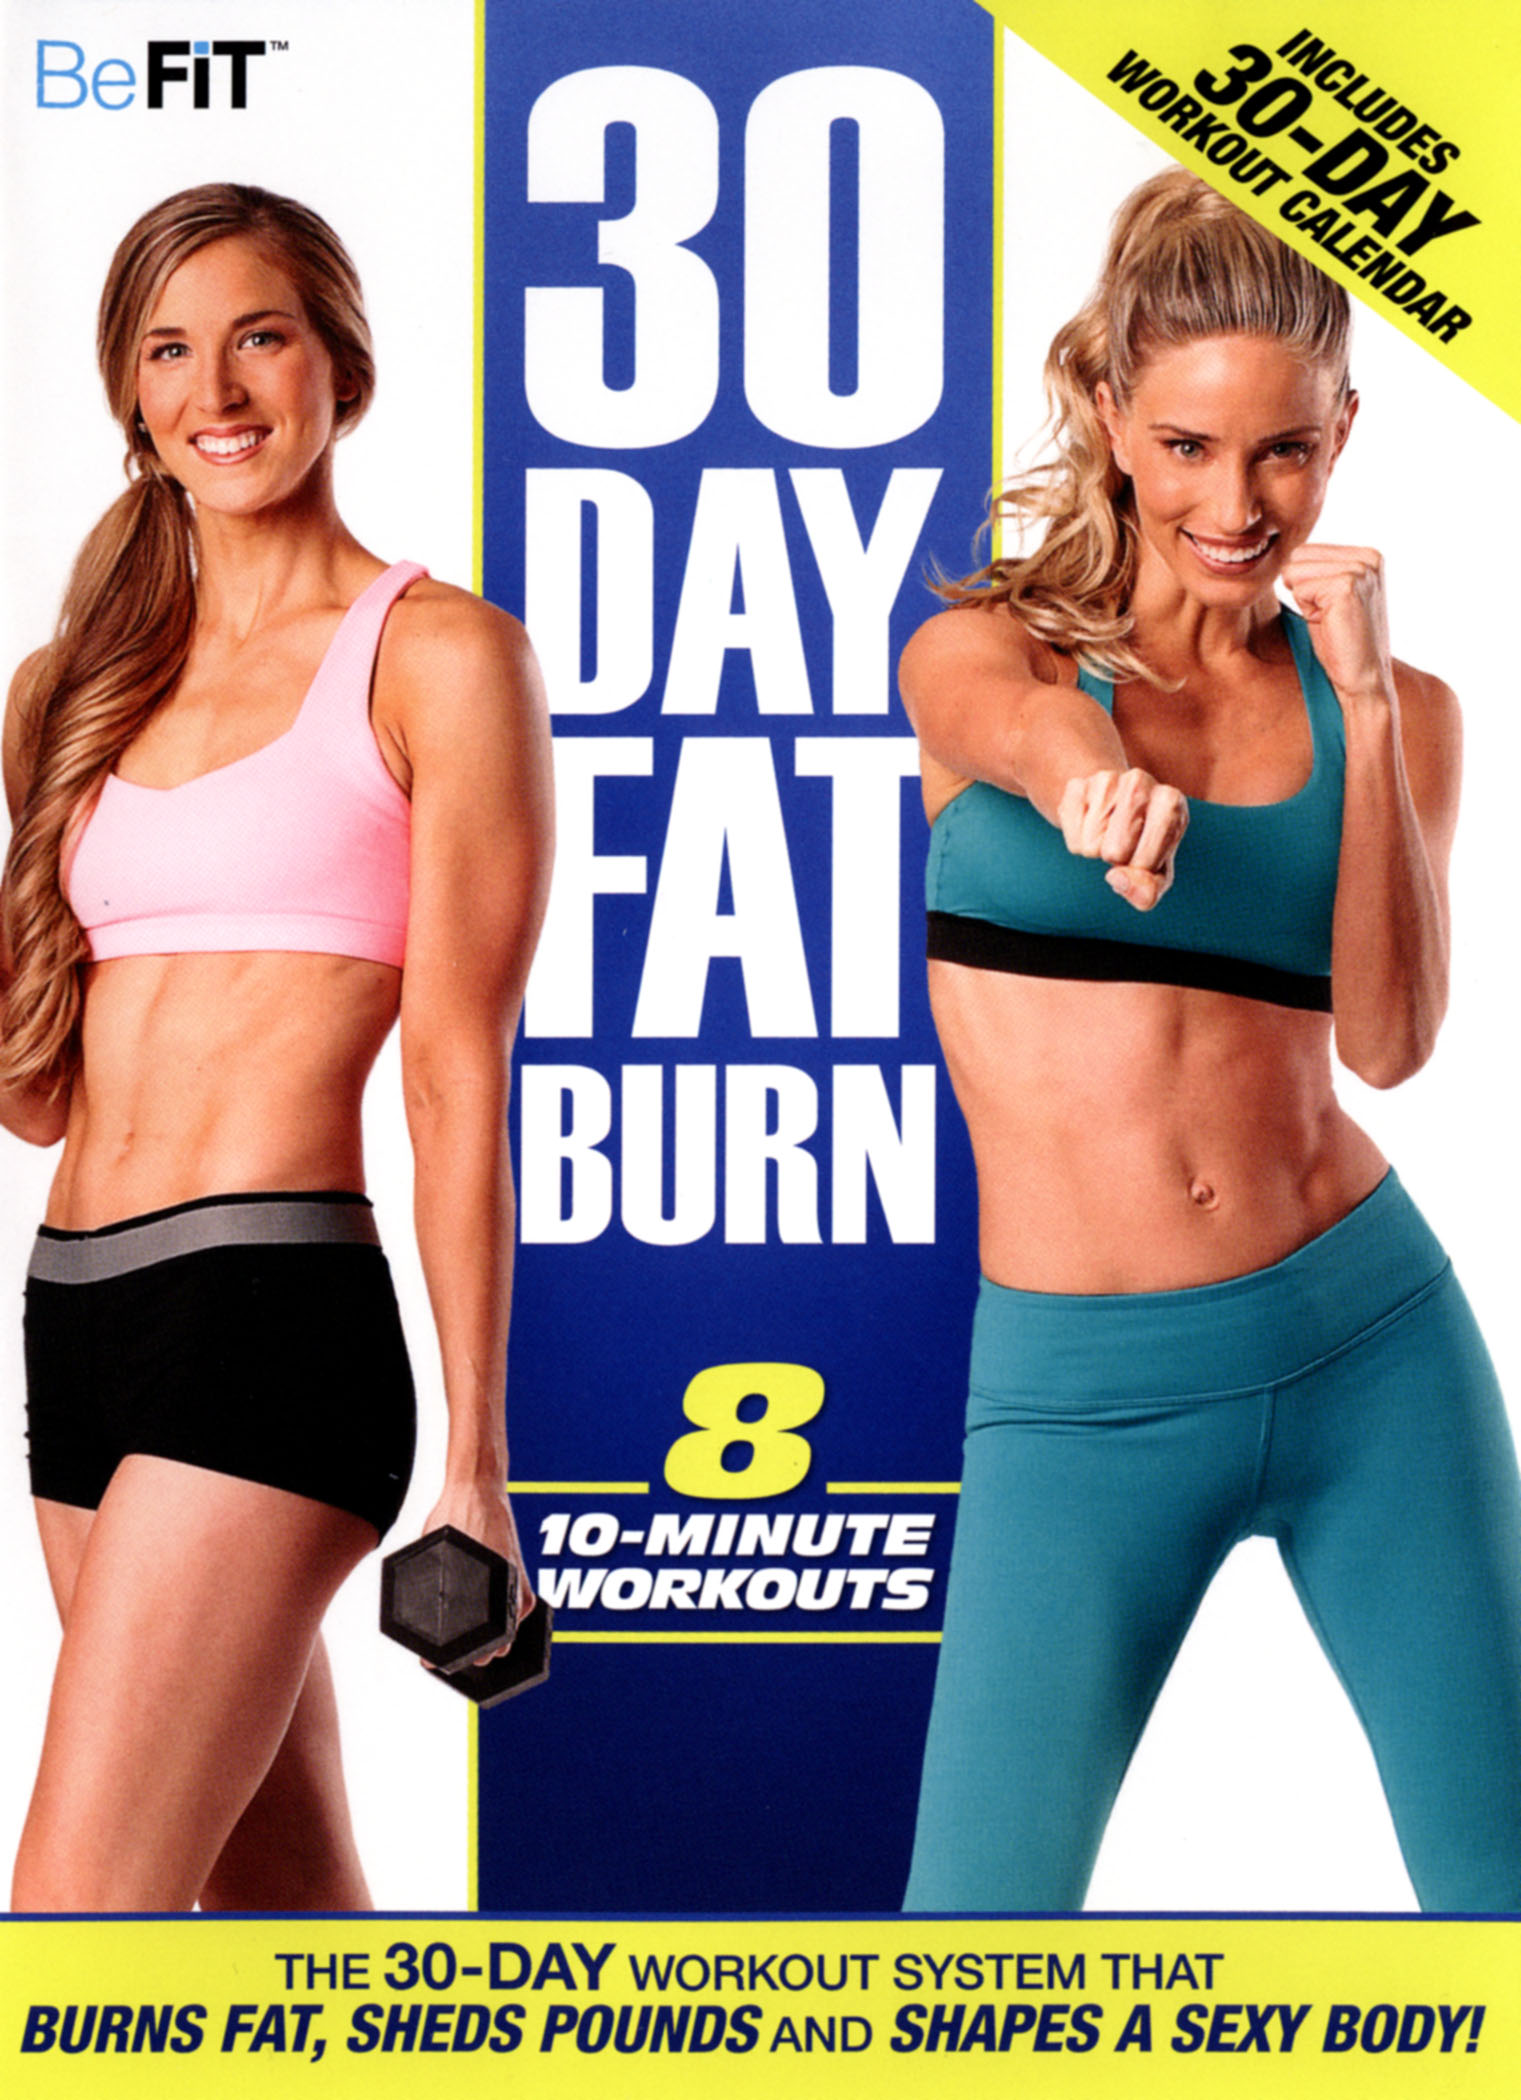 BeFit: 30-Day Fat Burn